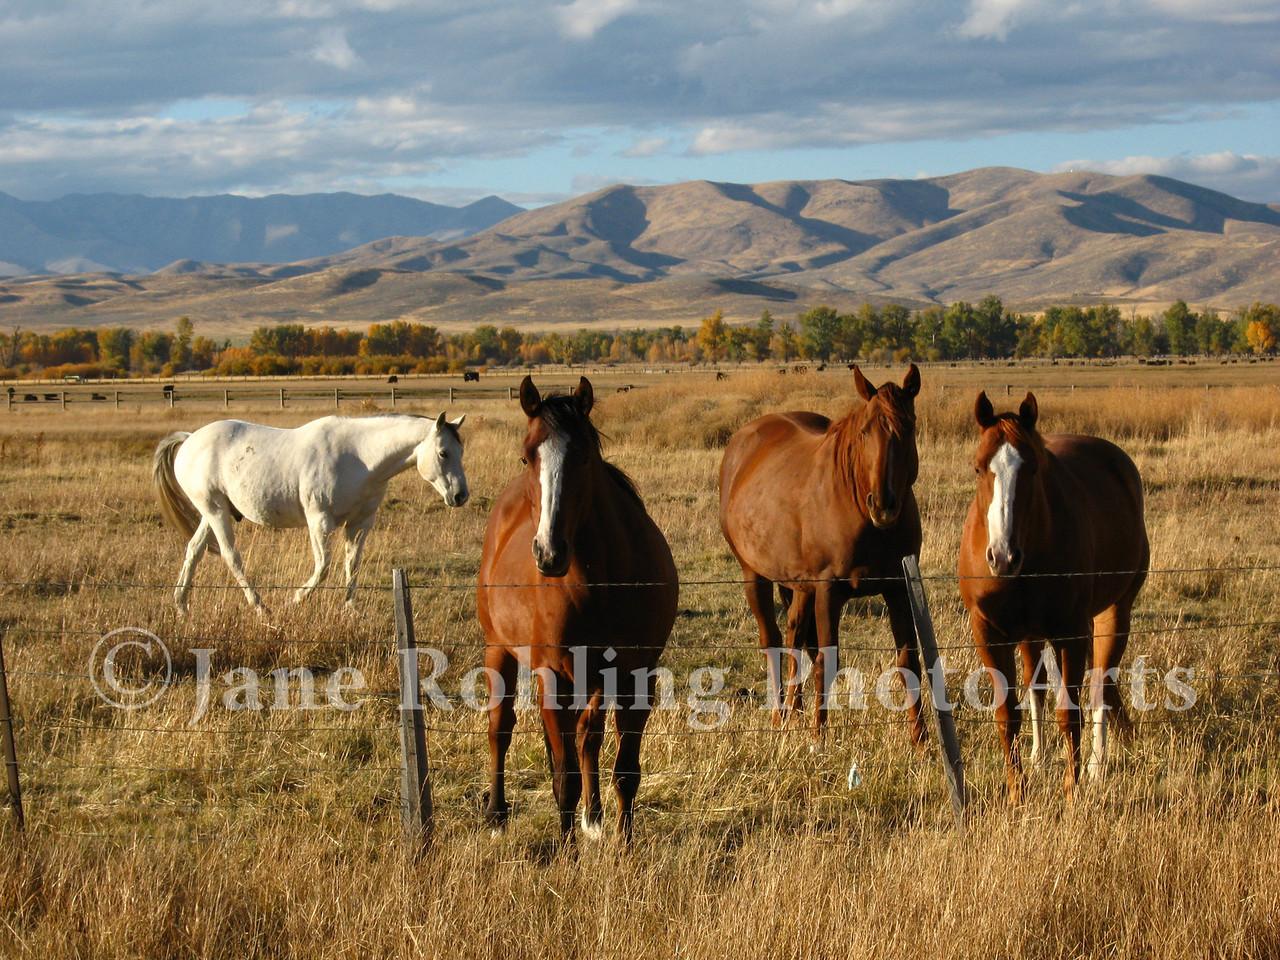 Curious horses greet the photographer along Highway 20 in Blaine County, Idaho.